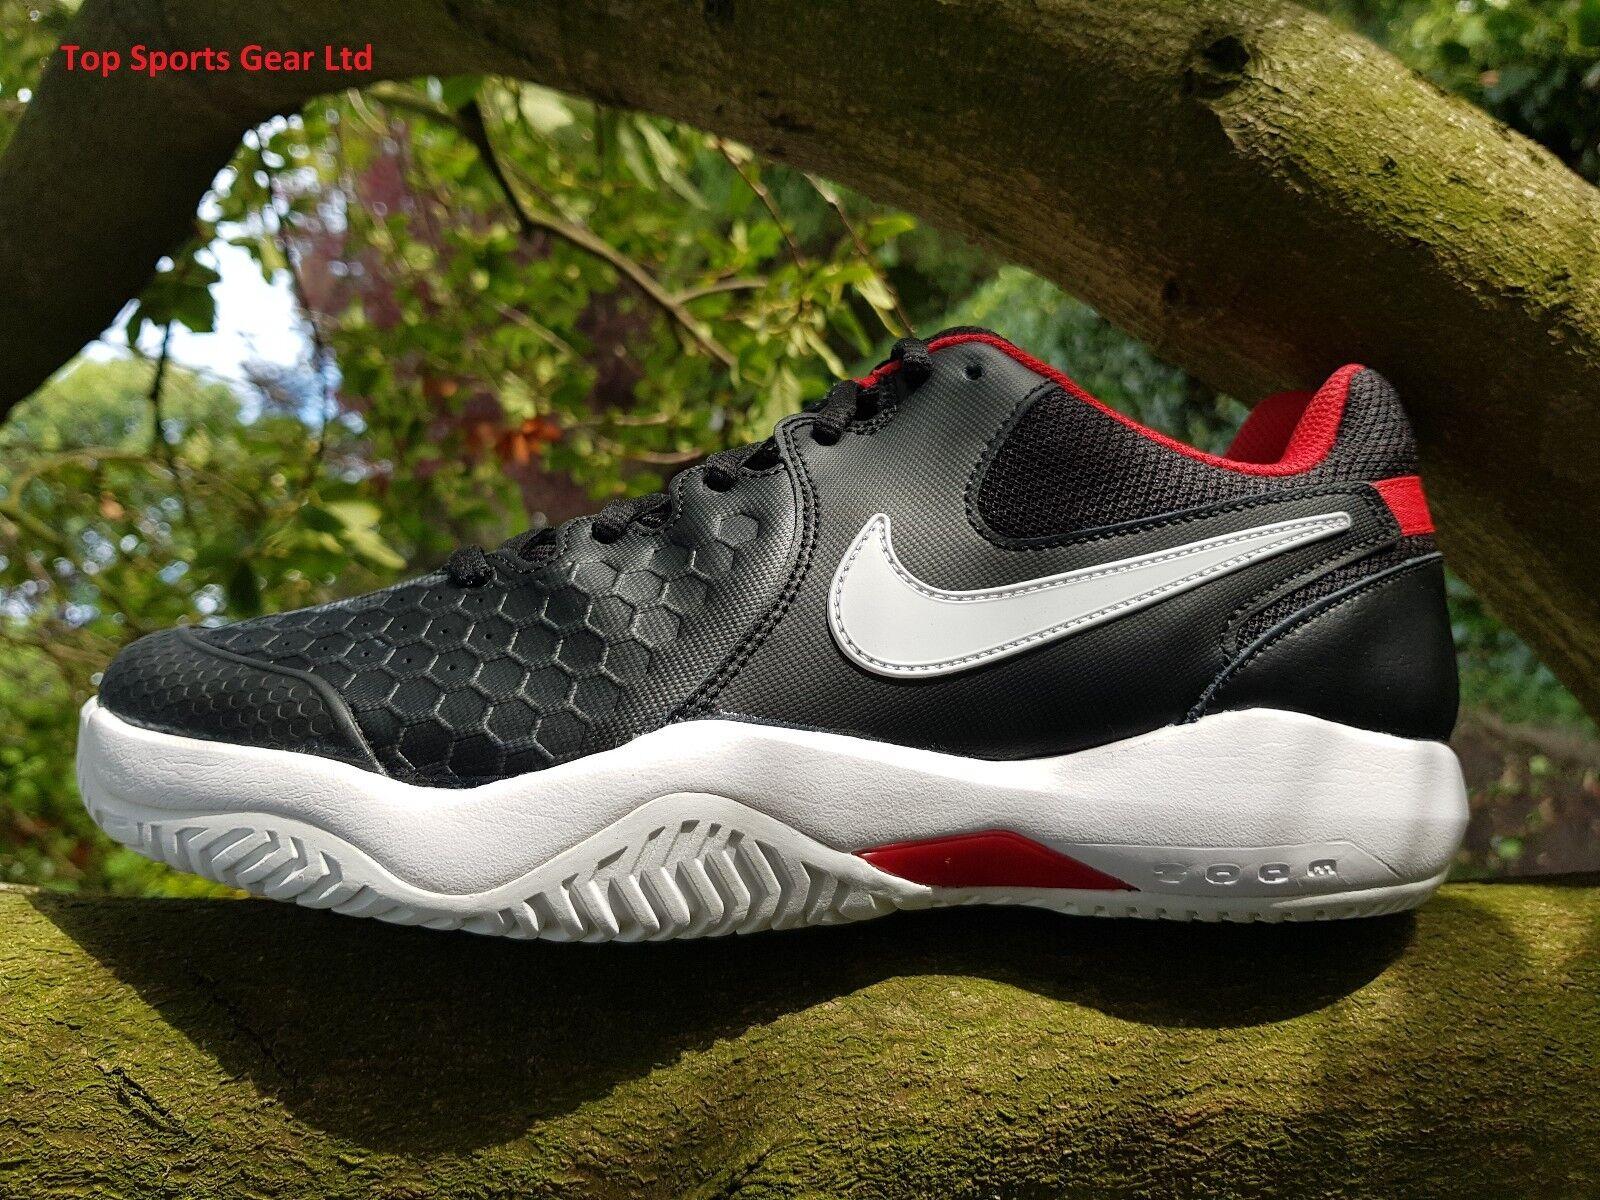 Nike Air Zoom Resistance Tennis Sports Comfortable Trainers Black BNIB UK 6 - 12